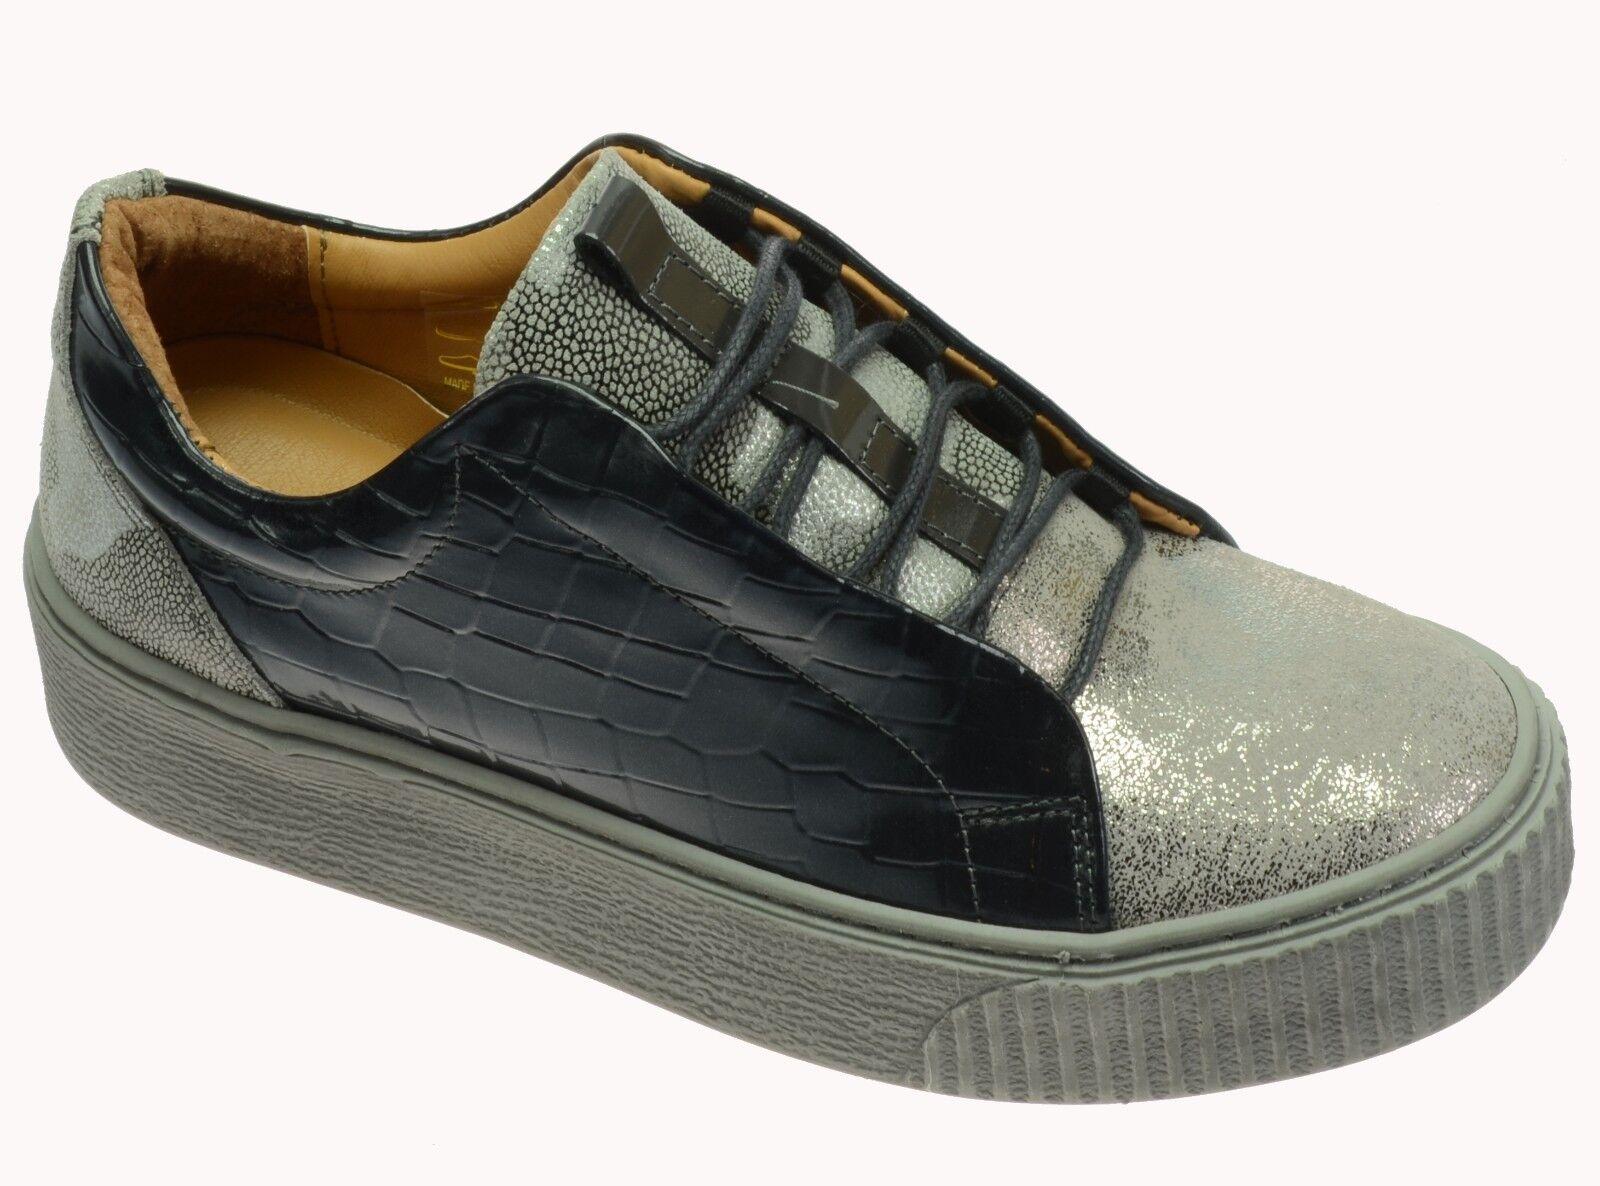 En ligne Shoes 5134-6 Grey max/prk-3009/pat. Baskets made made made in Portugal Véritable Cuir 91c562